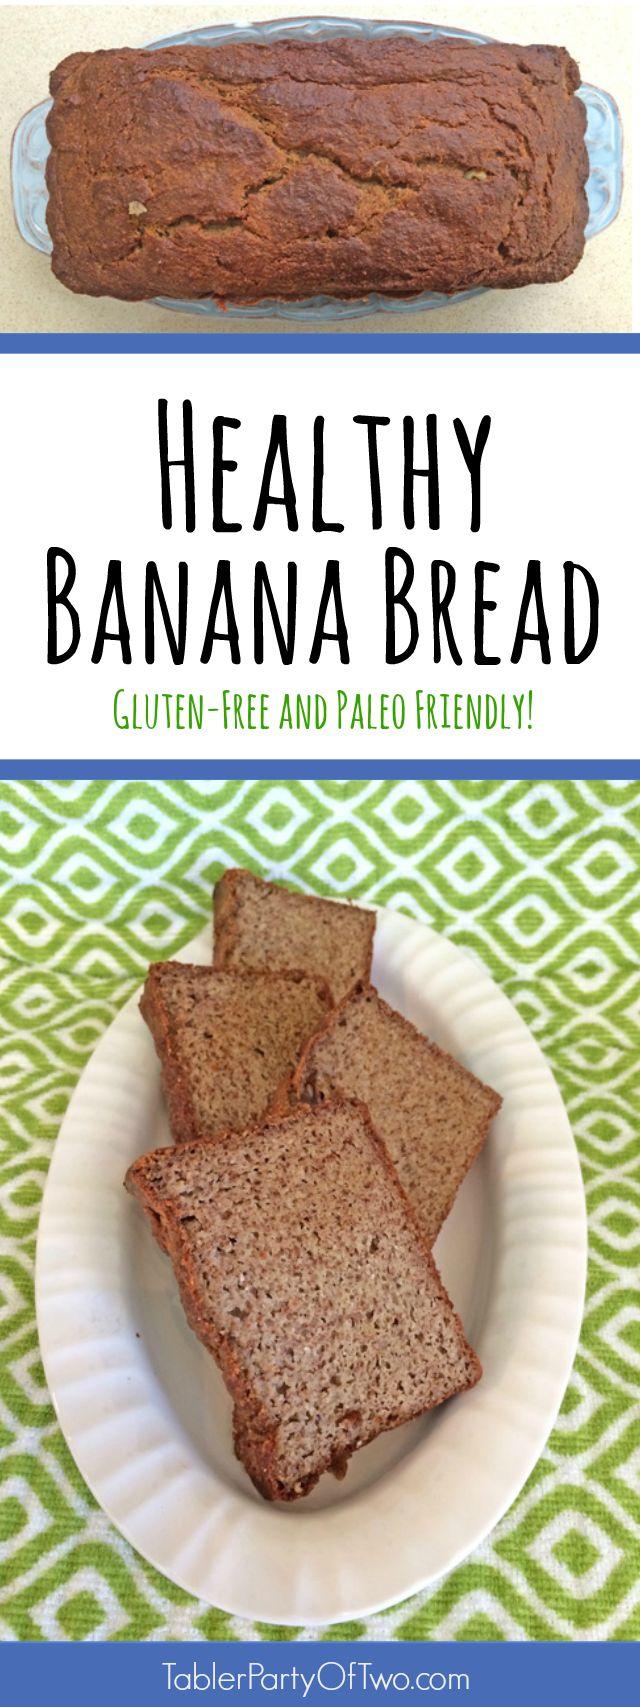 Healthy Banana Bread. Gluten Free and Paleo Friendly! And OH SO YUMMY!